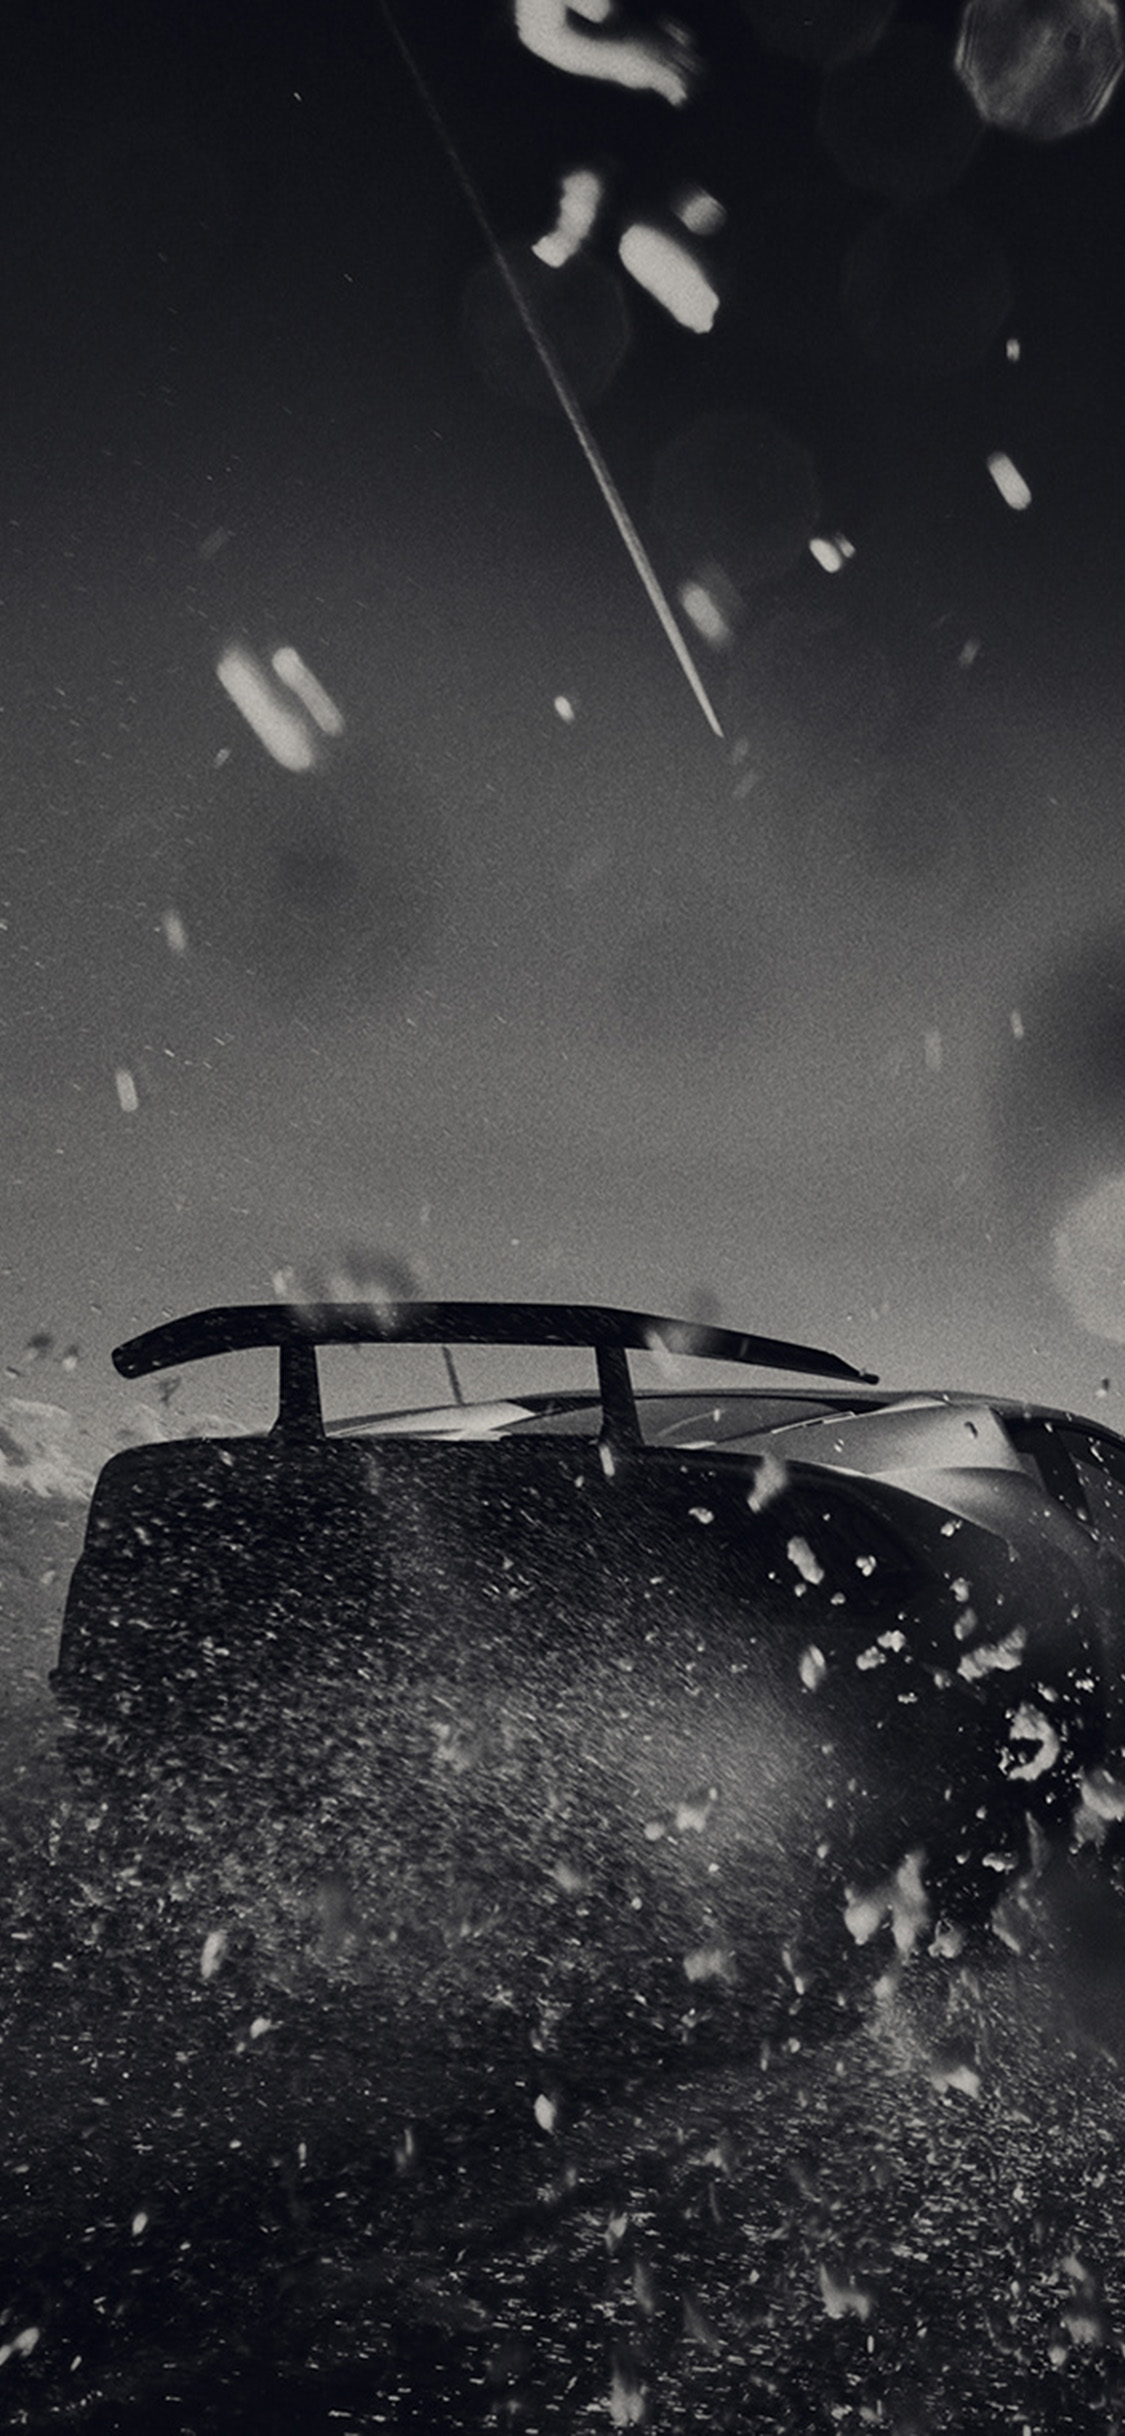 iPhonexpapers.com-Apple-iPhone-wallpaper-bh34-racing-car-bw-dark-art